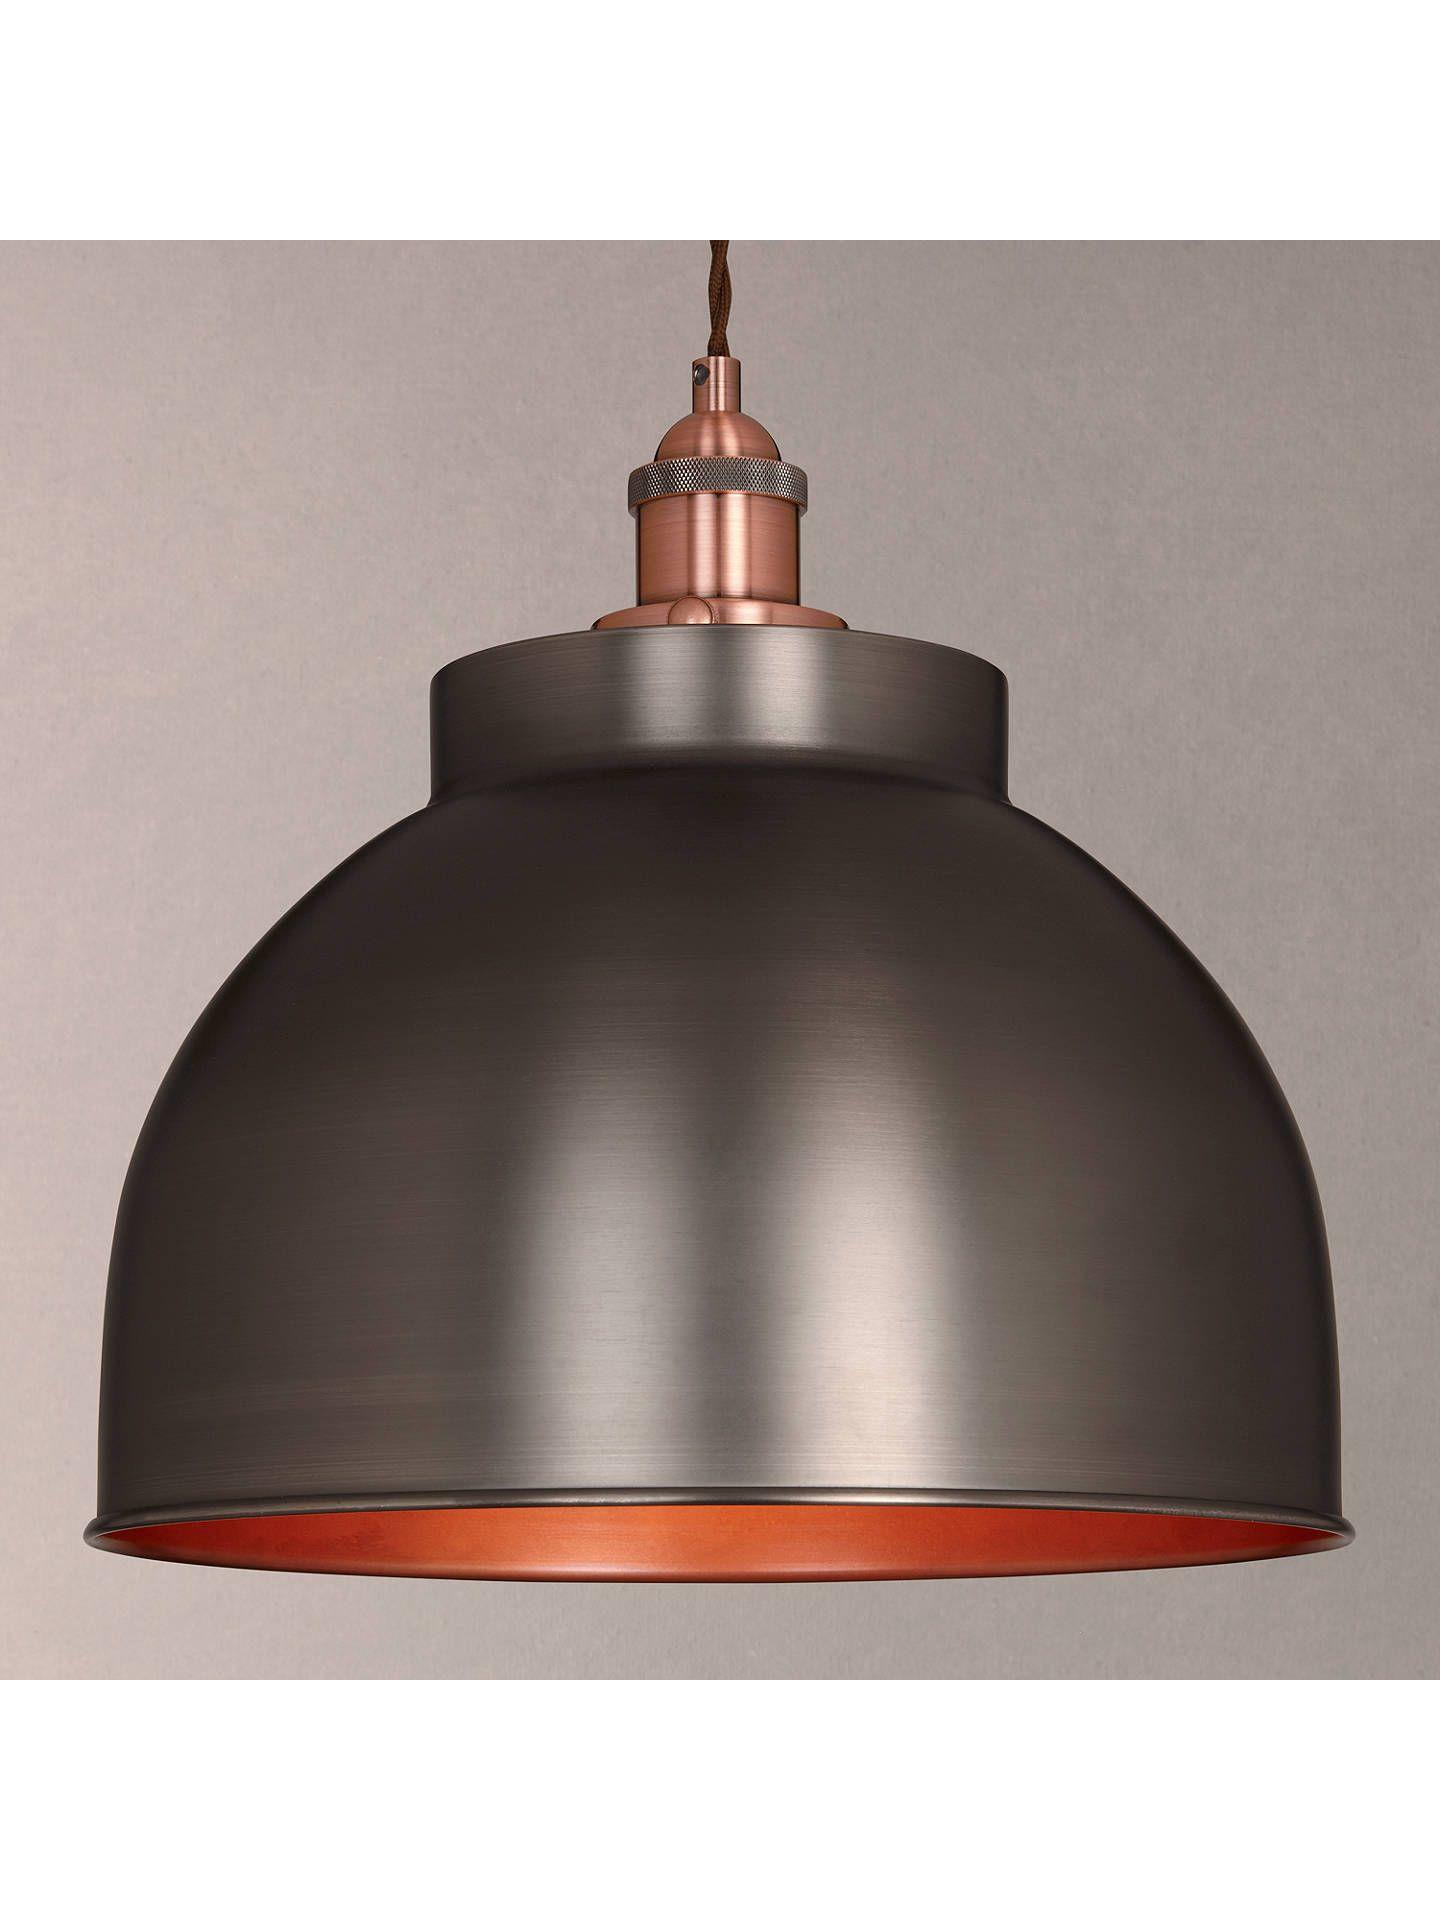 John Lewis Partners Baldwin Large Pendant Ceiling Light